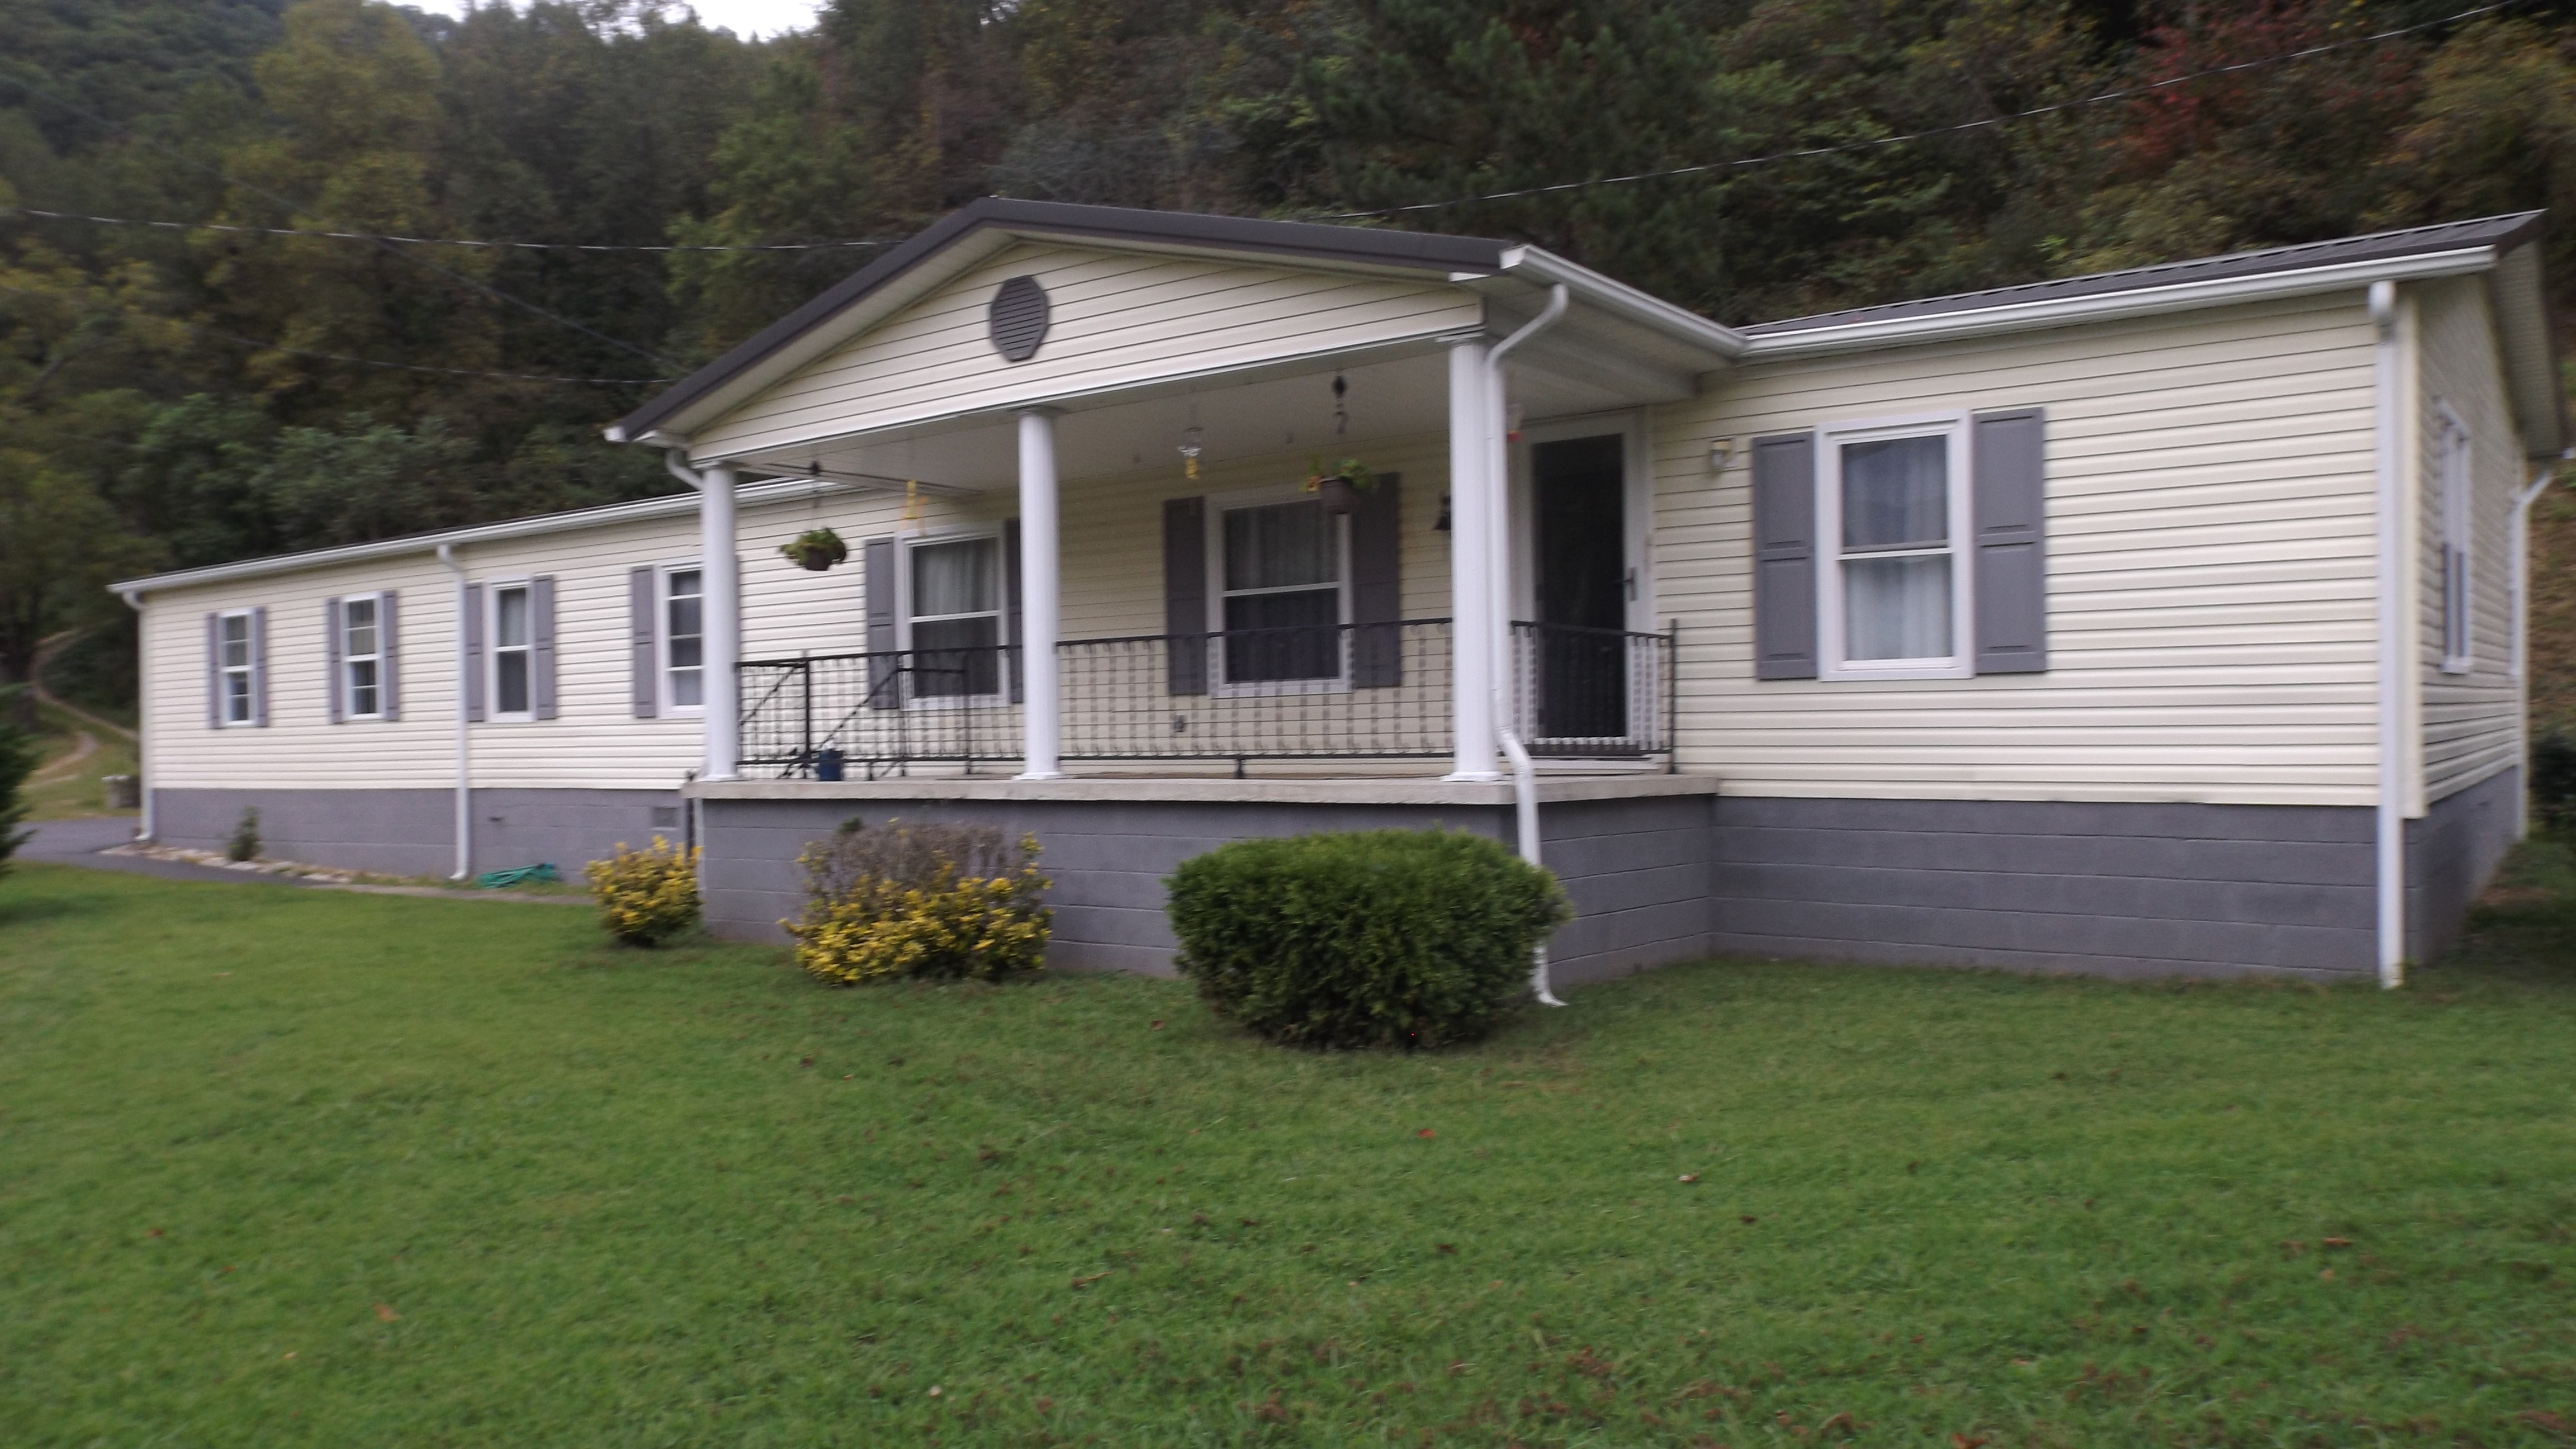 Butternut Lane, Williamson, West Virginia 25661